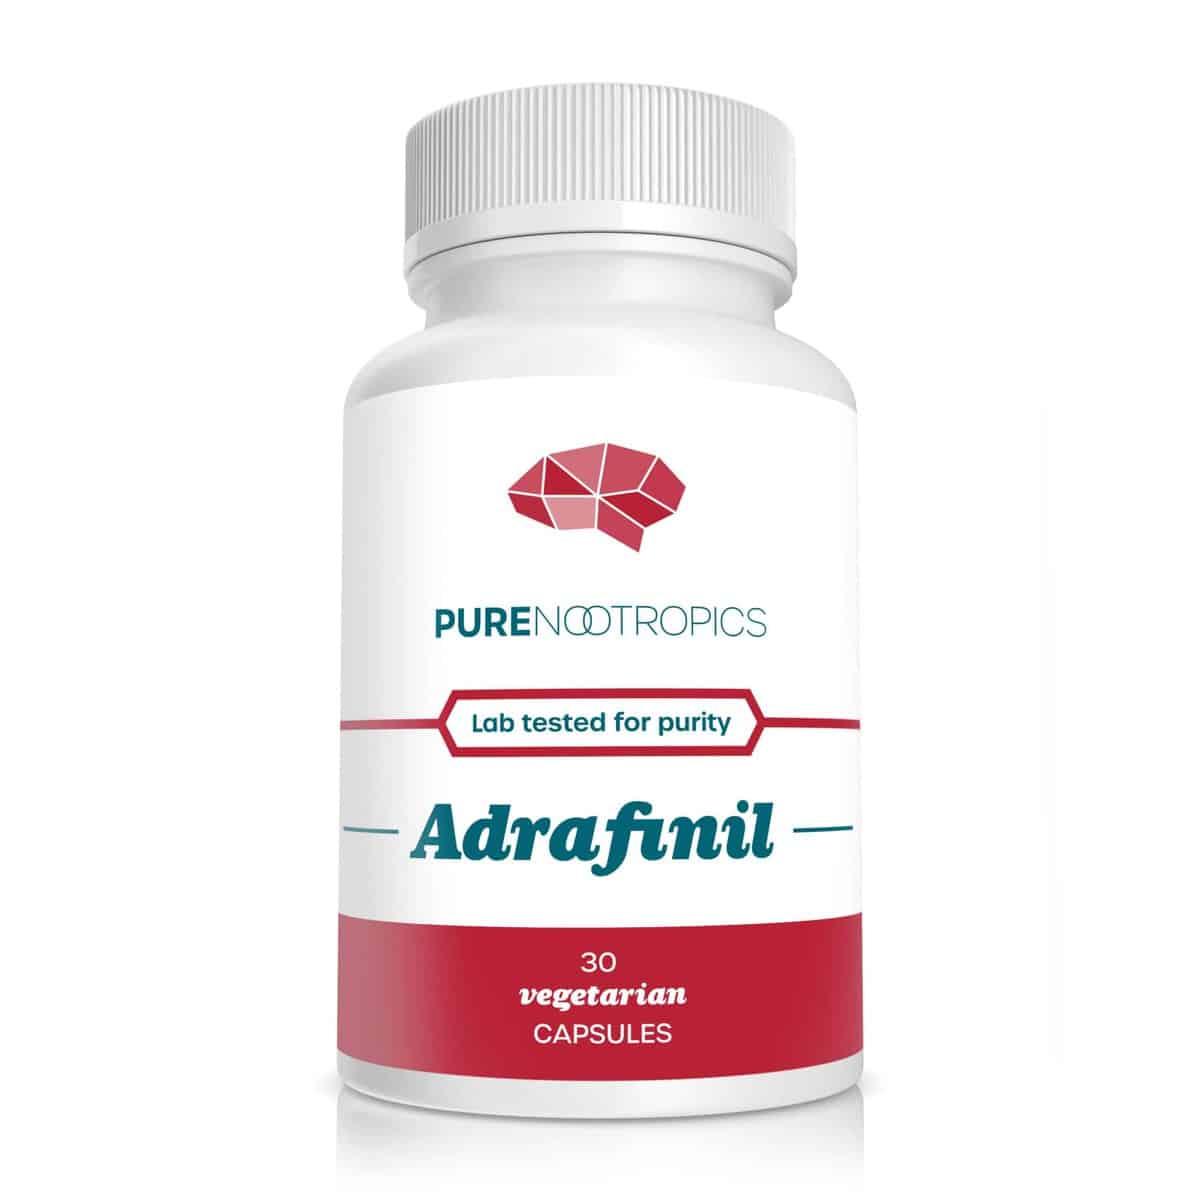 where to buy Adrafinil, buy Adrafinil from pure nootropics